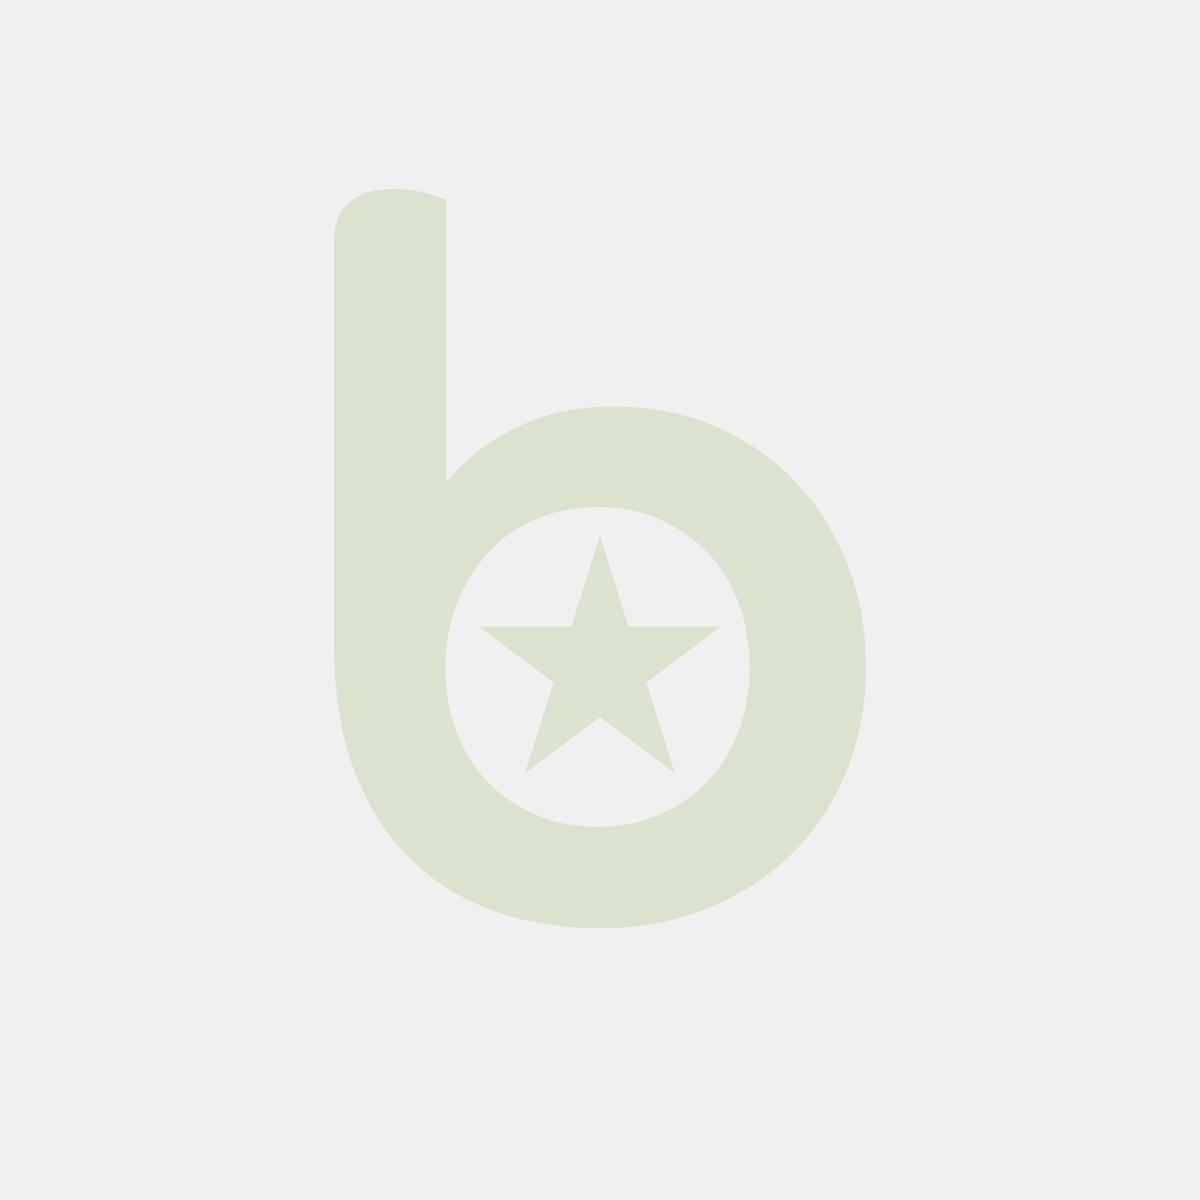 Miara barmańska - 25 ml + 35 ml - kod 596715